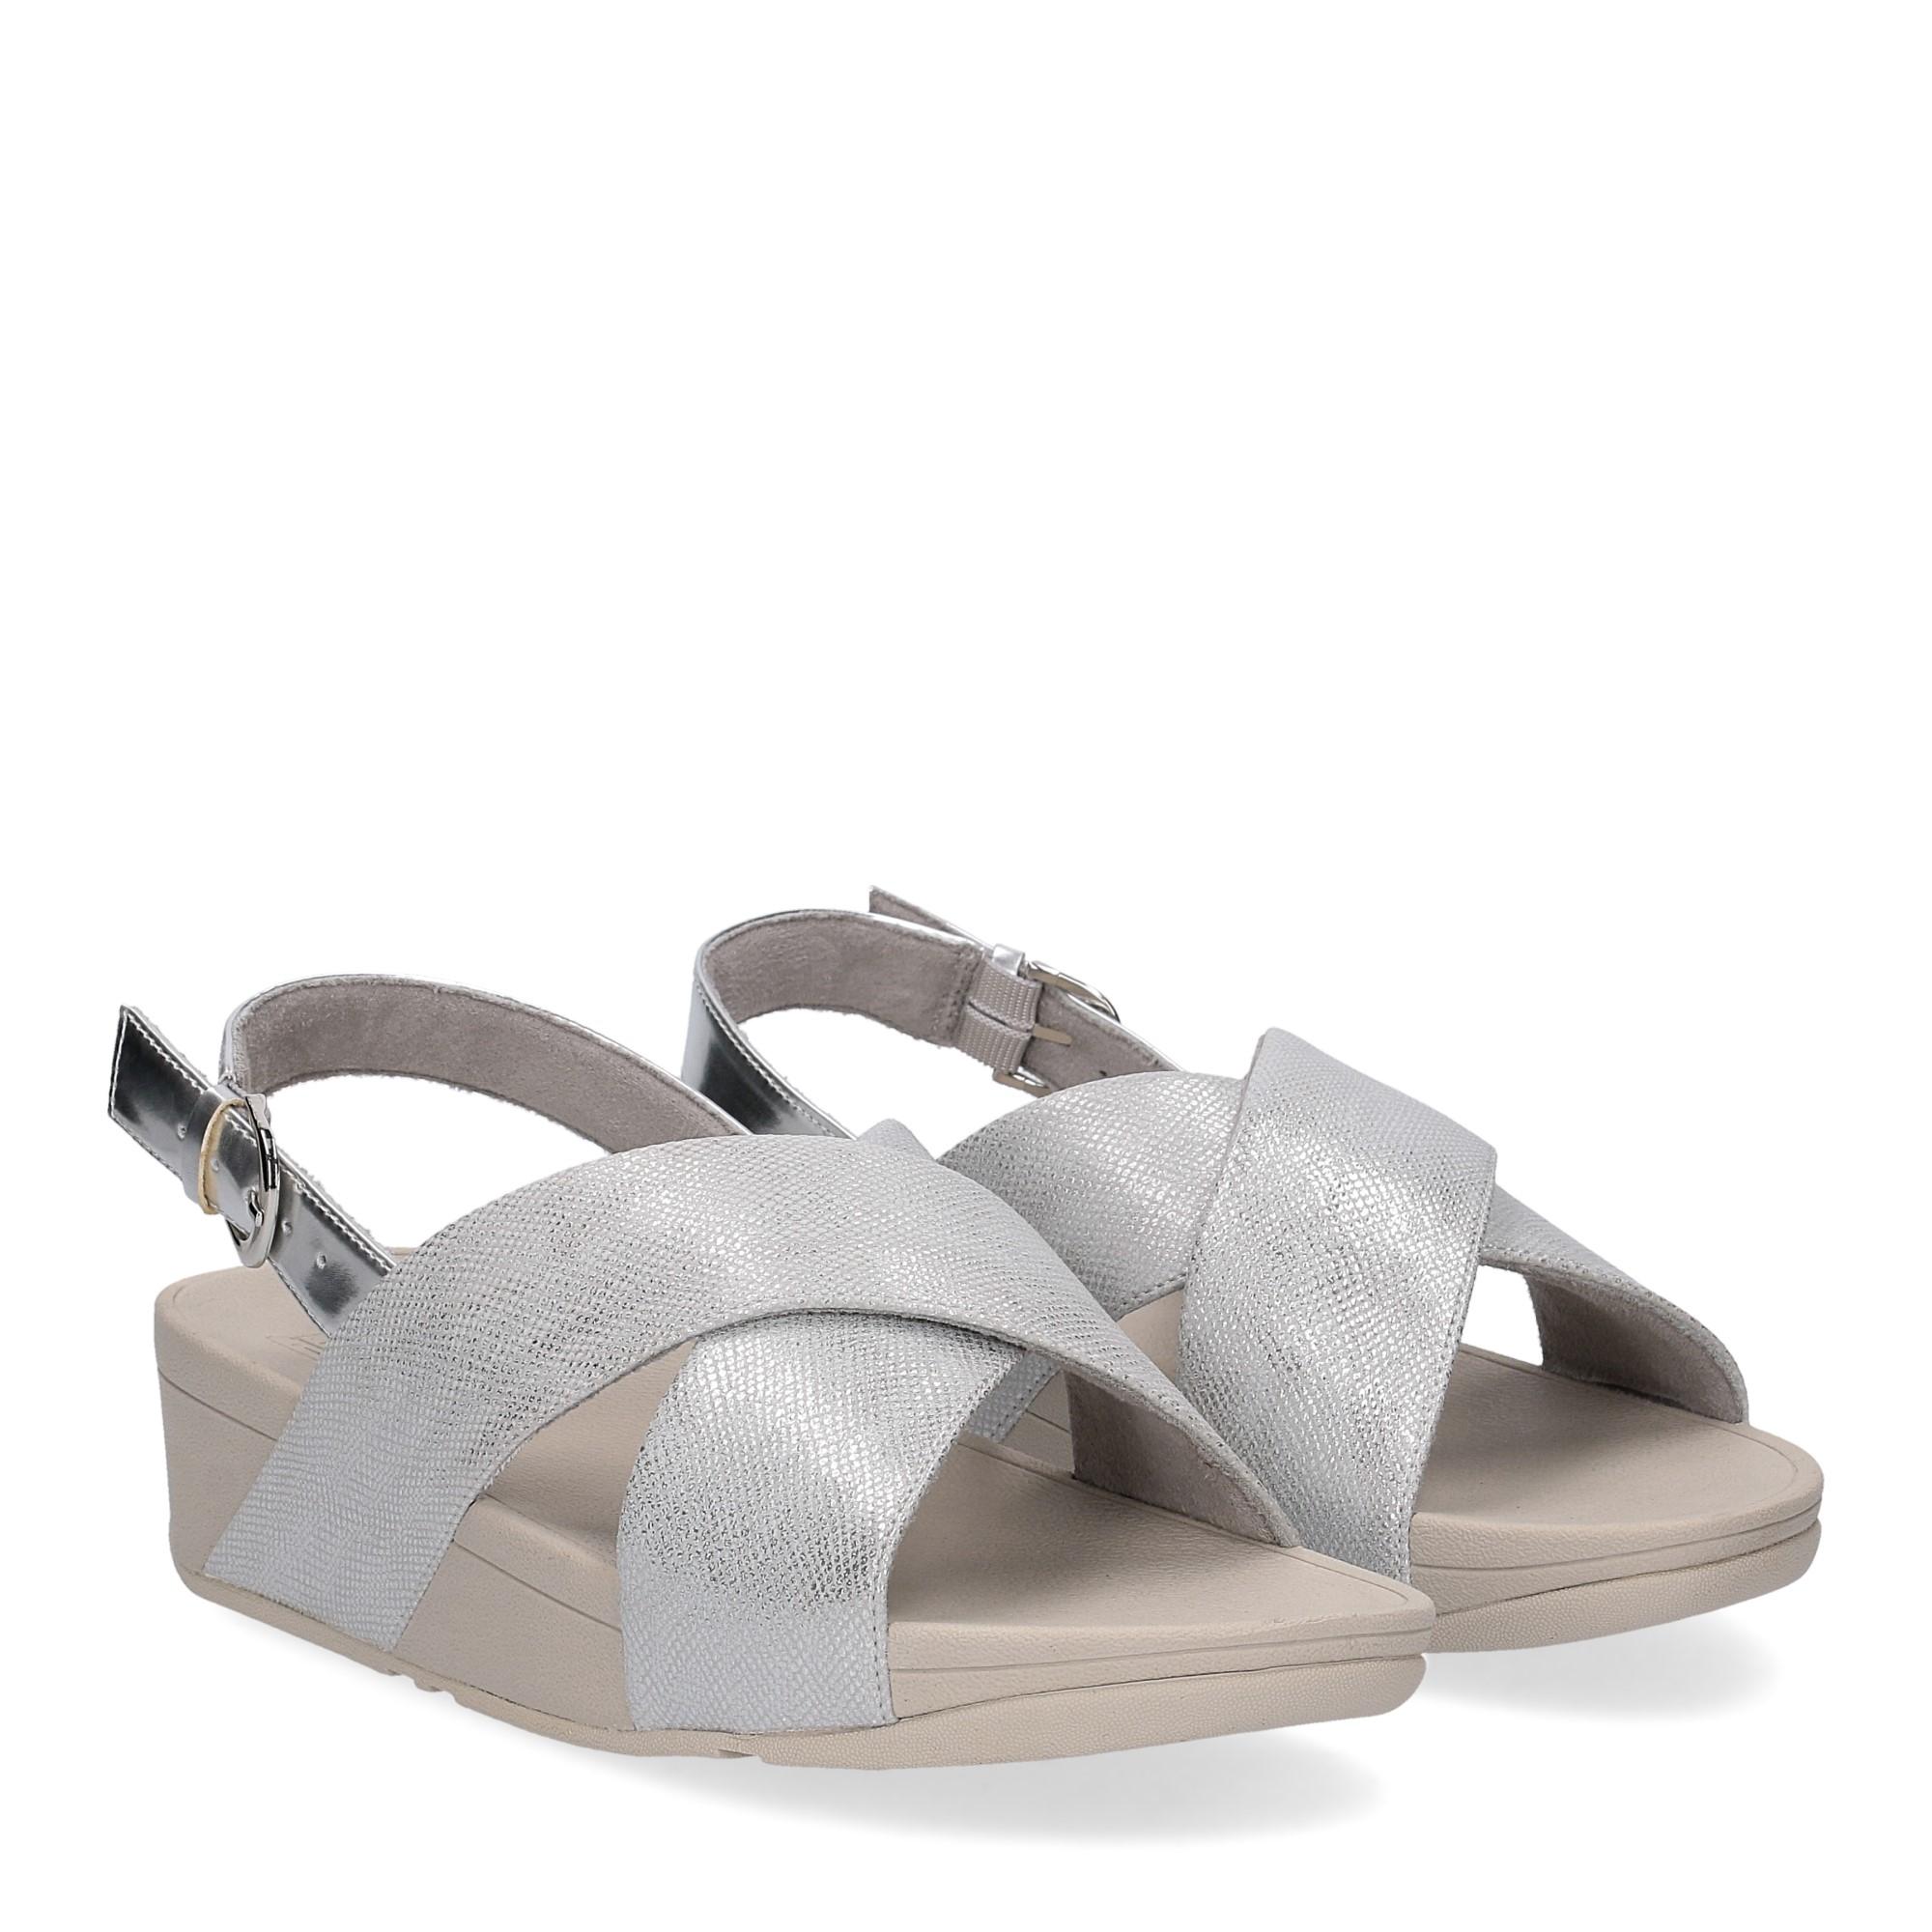 Fitflop Lulu Cross Back Strap Sandal shimmer print silver